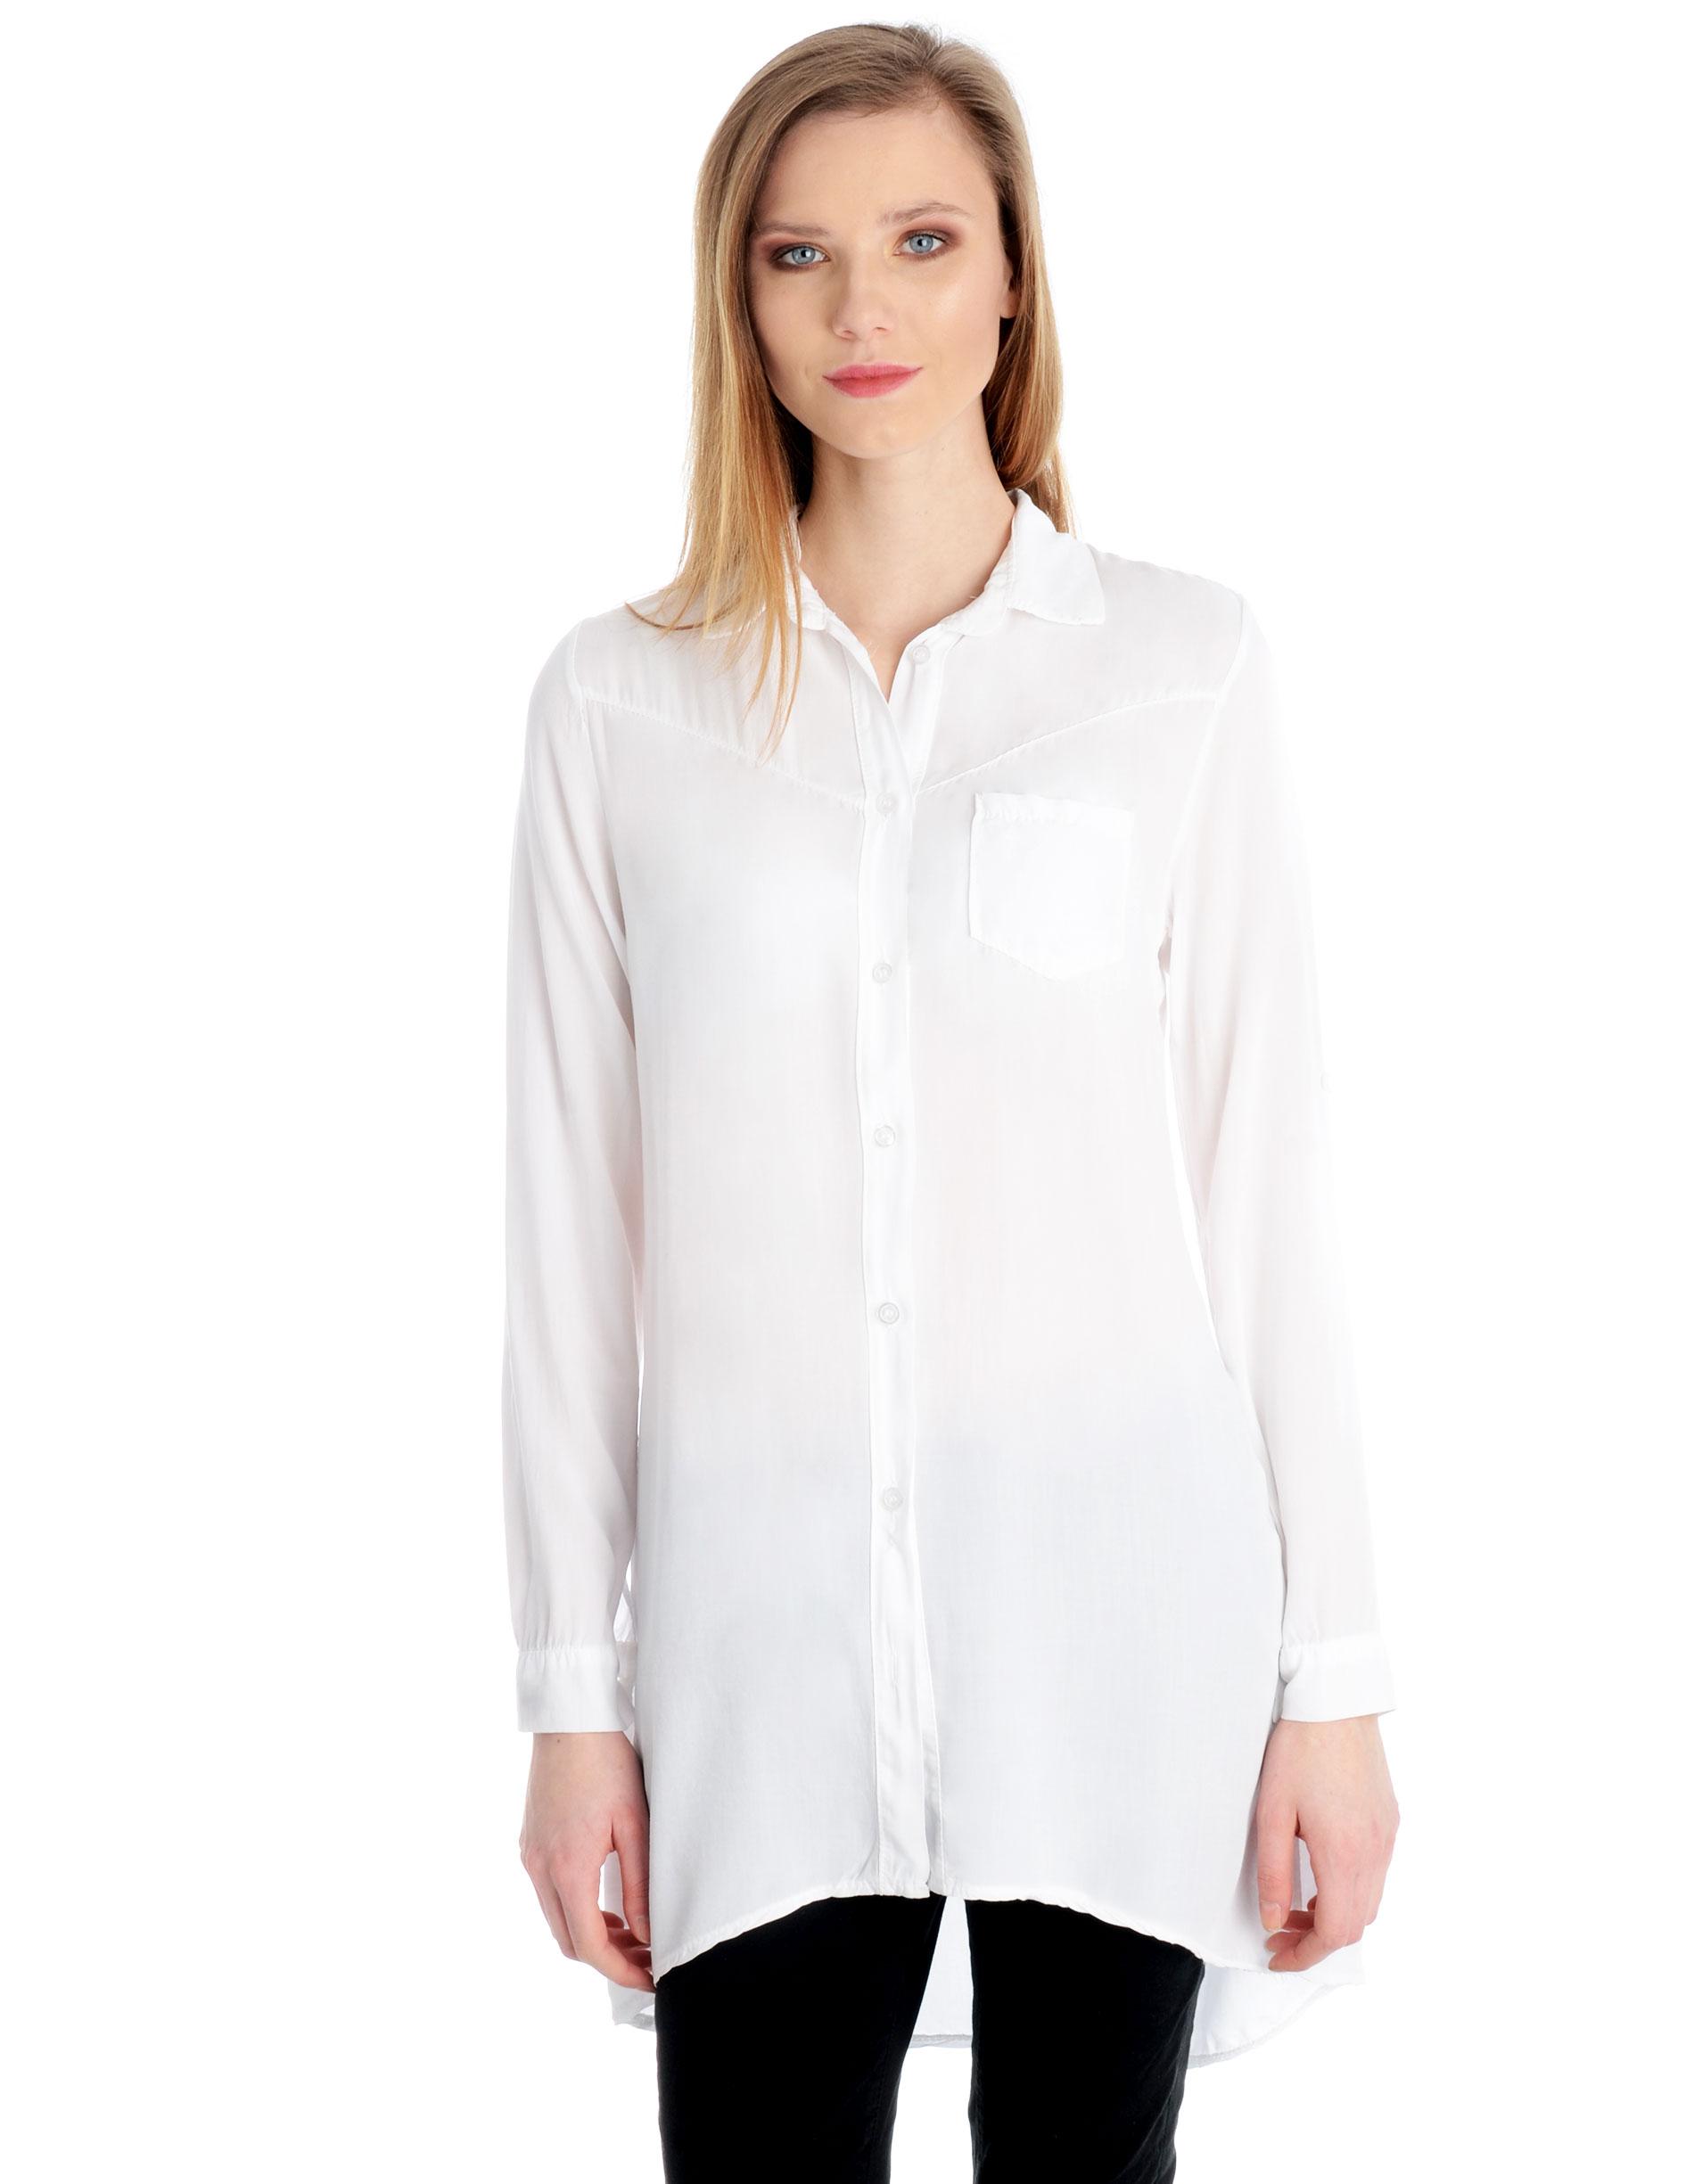 Koszula - 45-518 BIANCO - Unisono